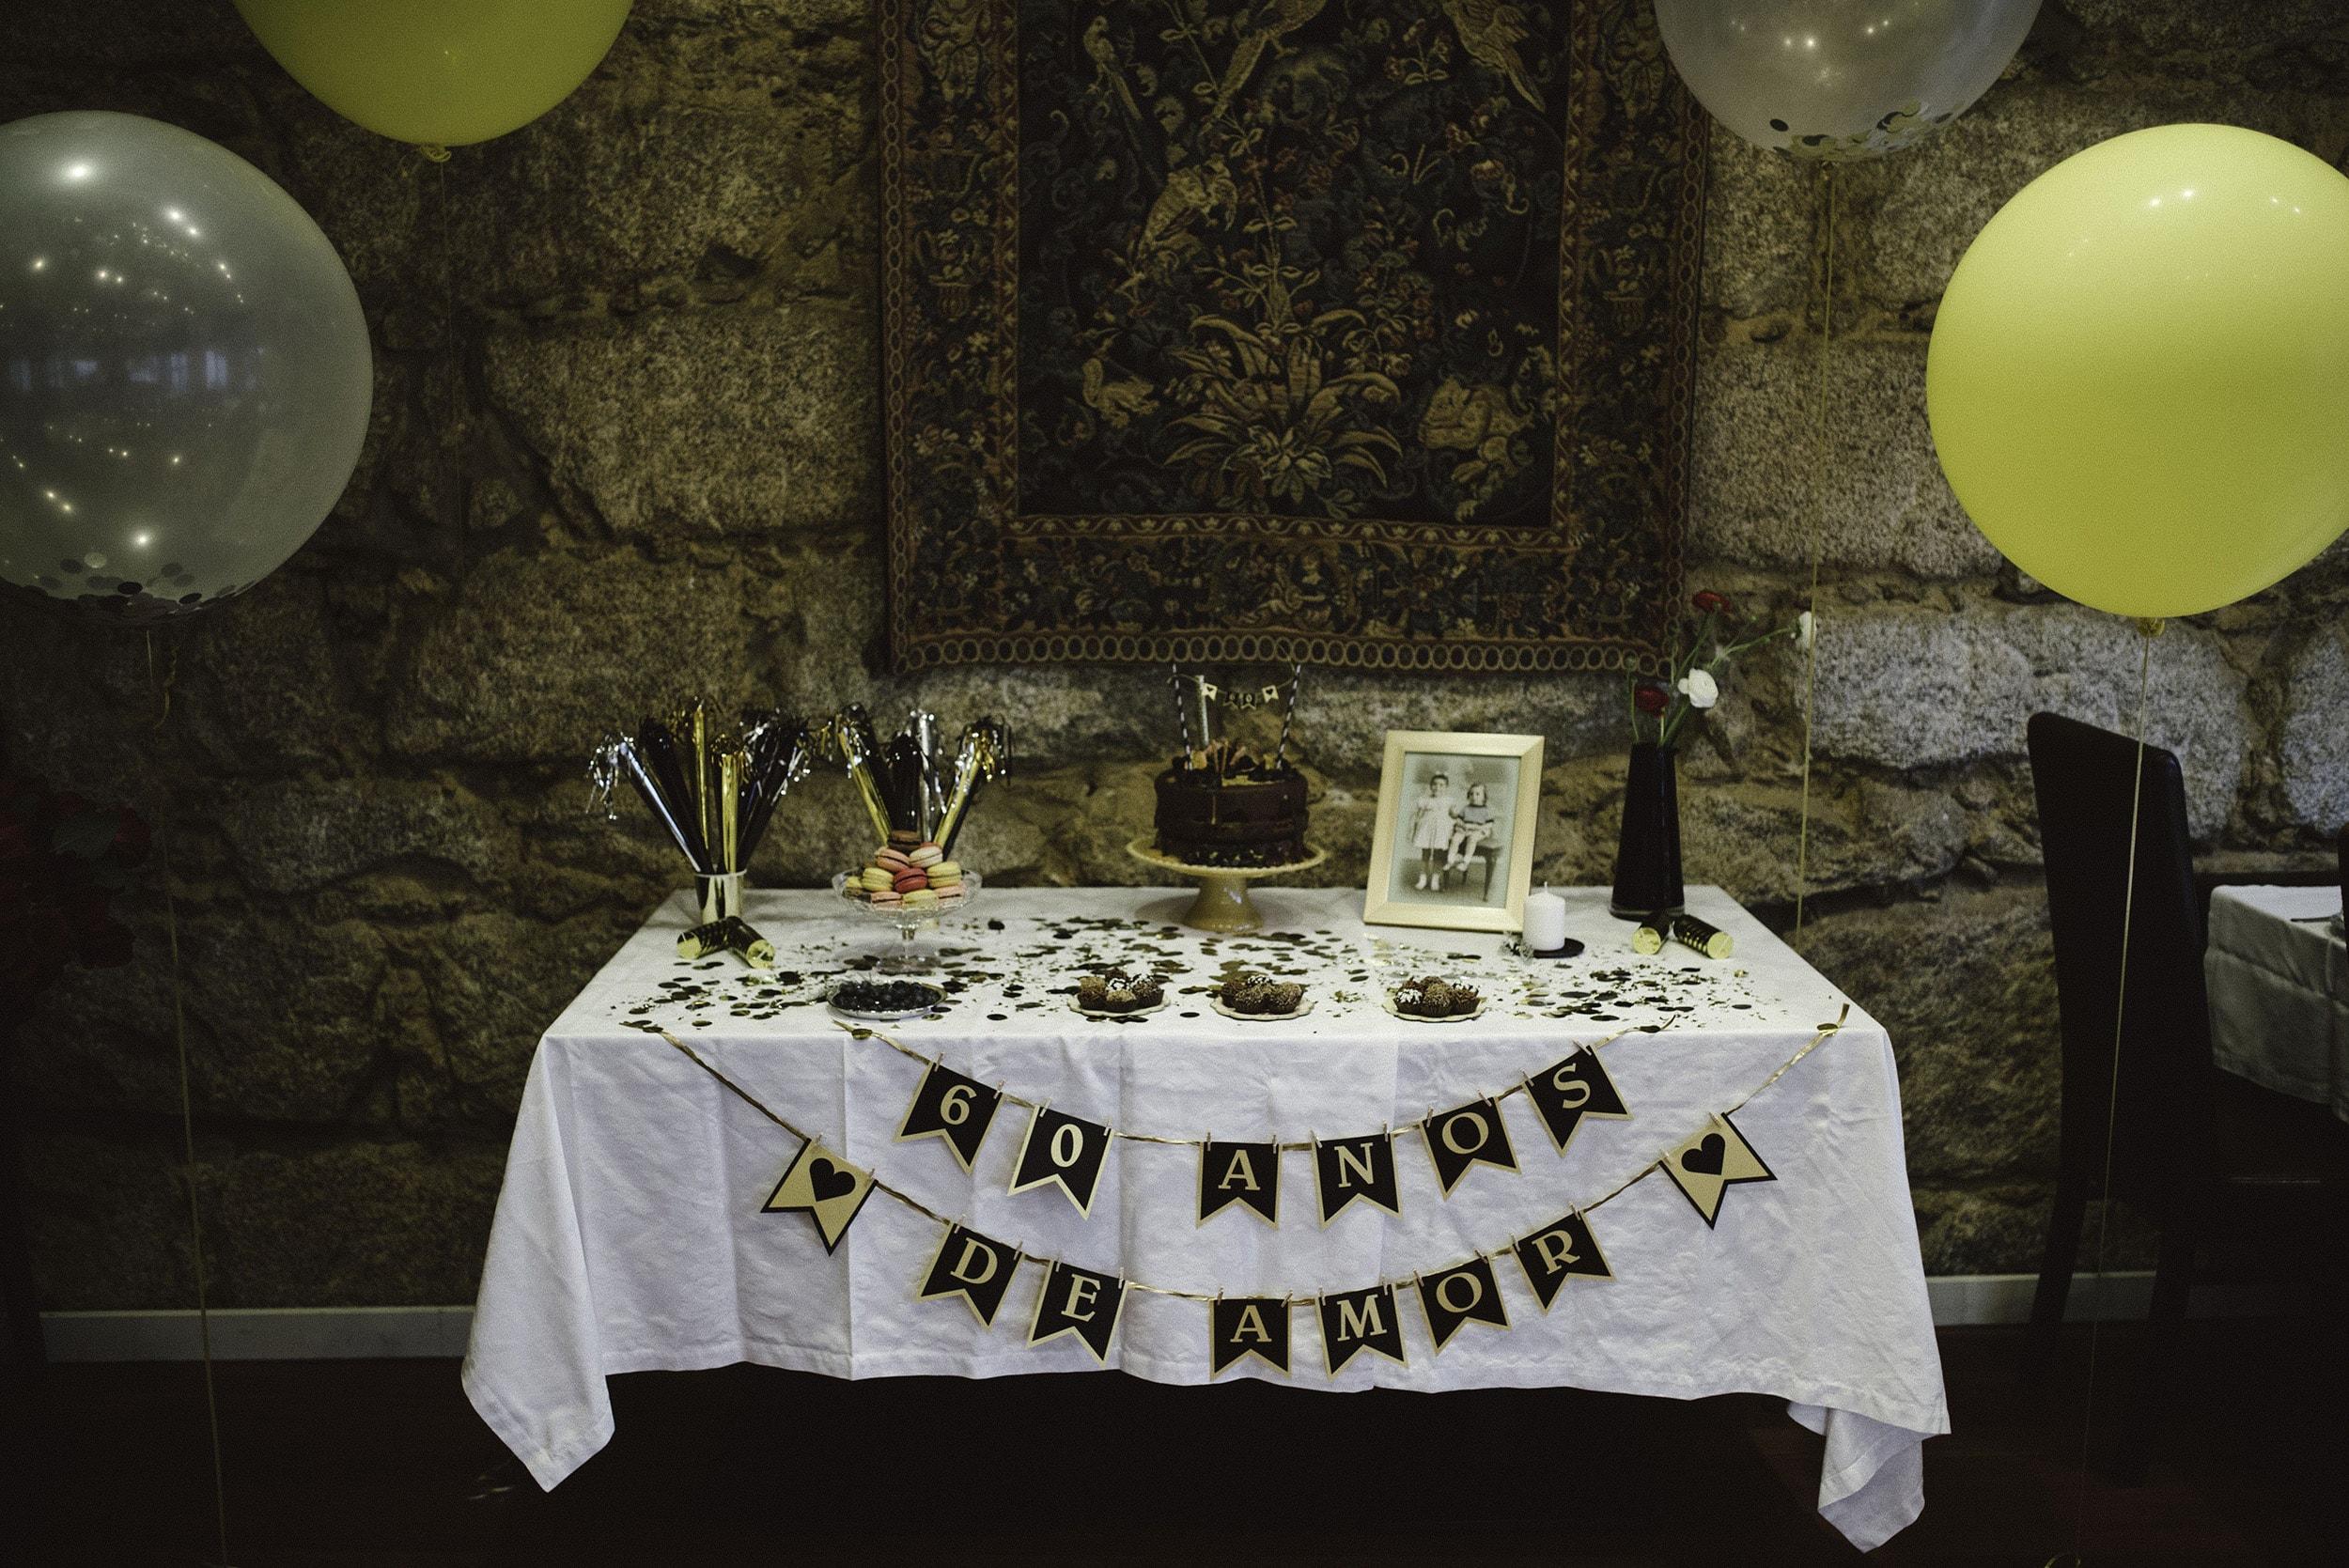 roma-organizacao-eventos-festa-de-aniversario-9